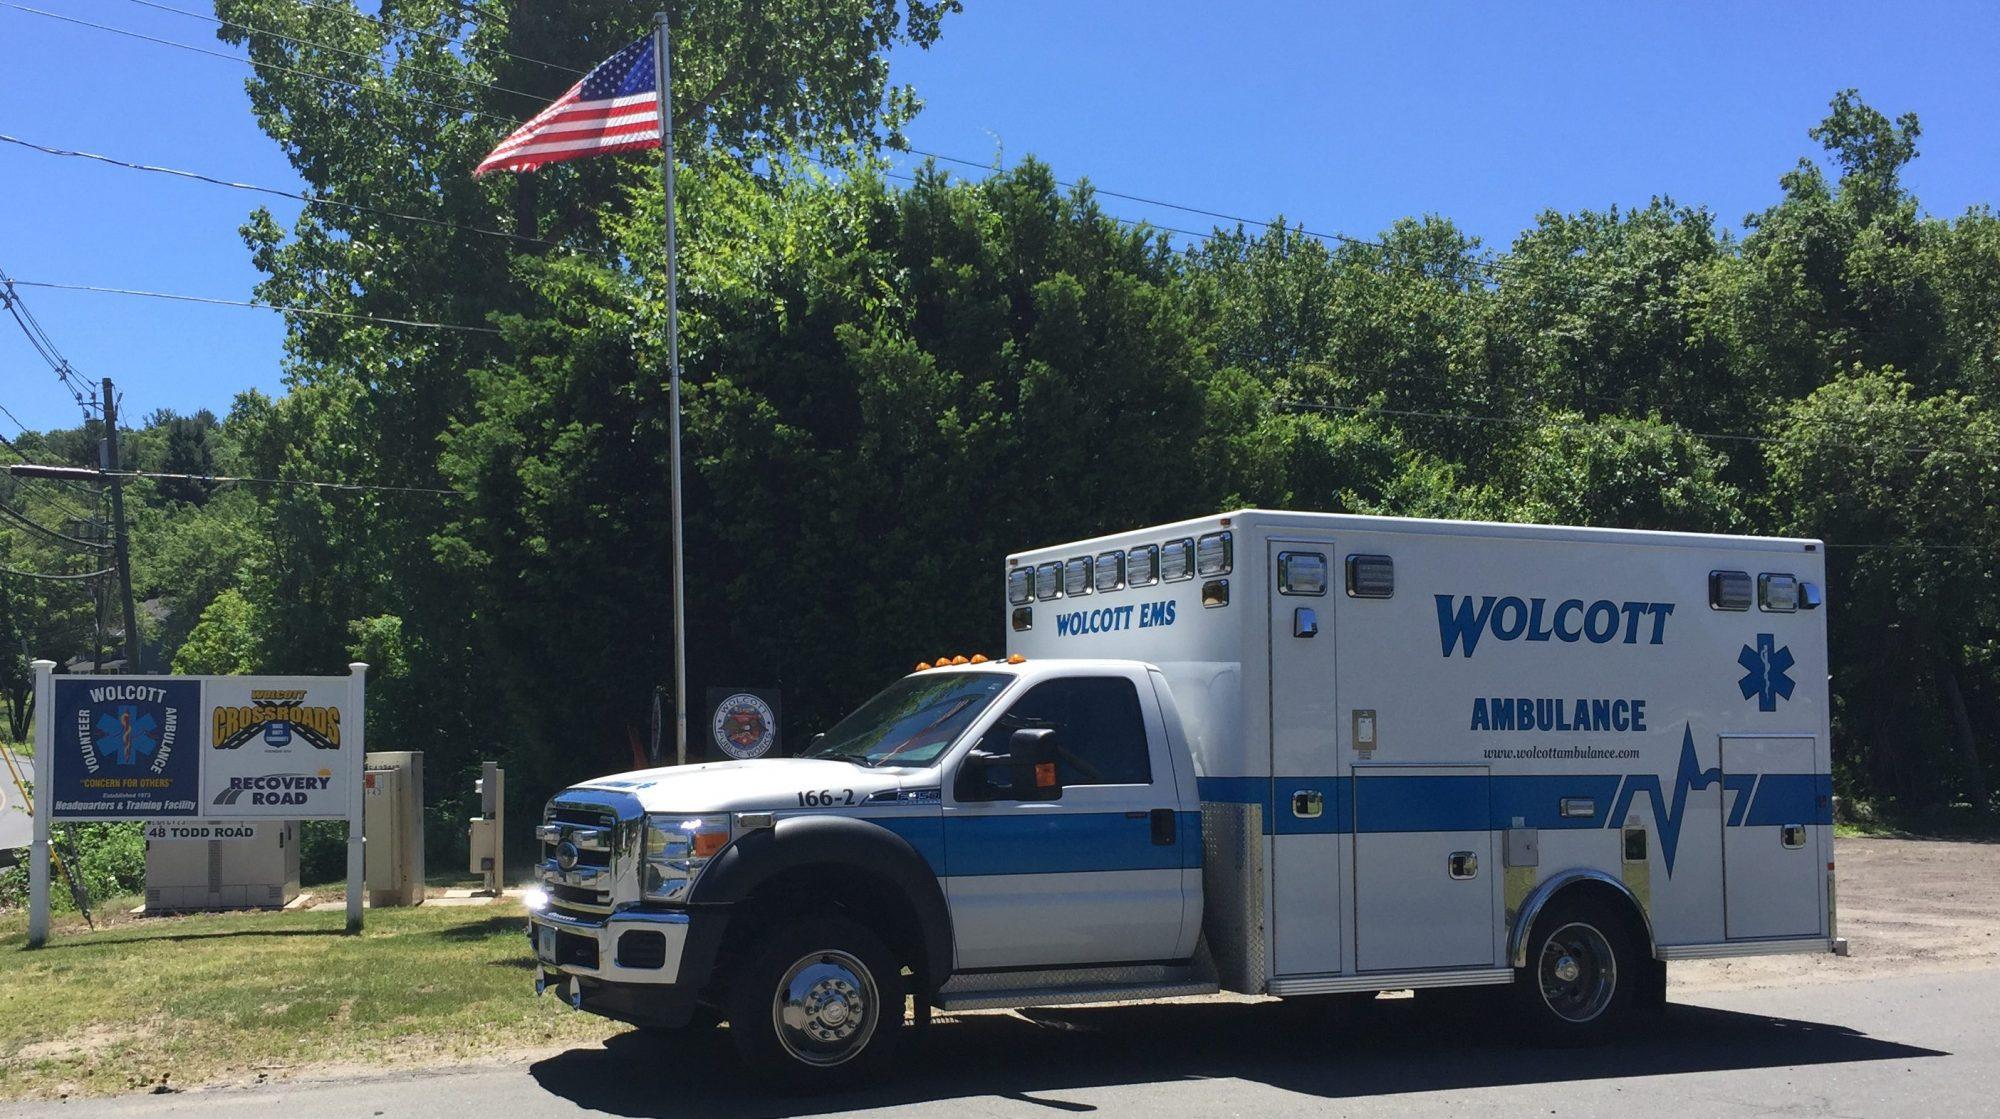 Wolcott Volunteer Ambulance Association